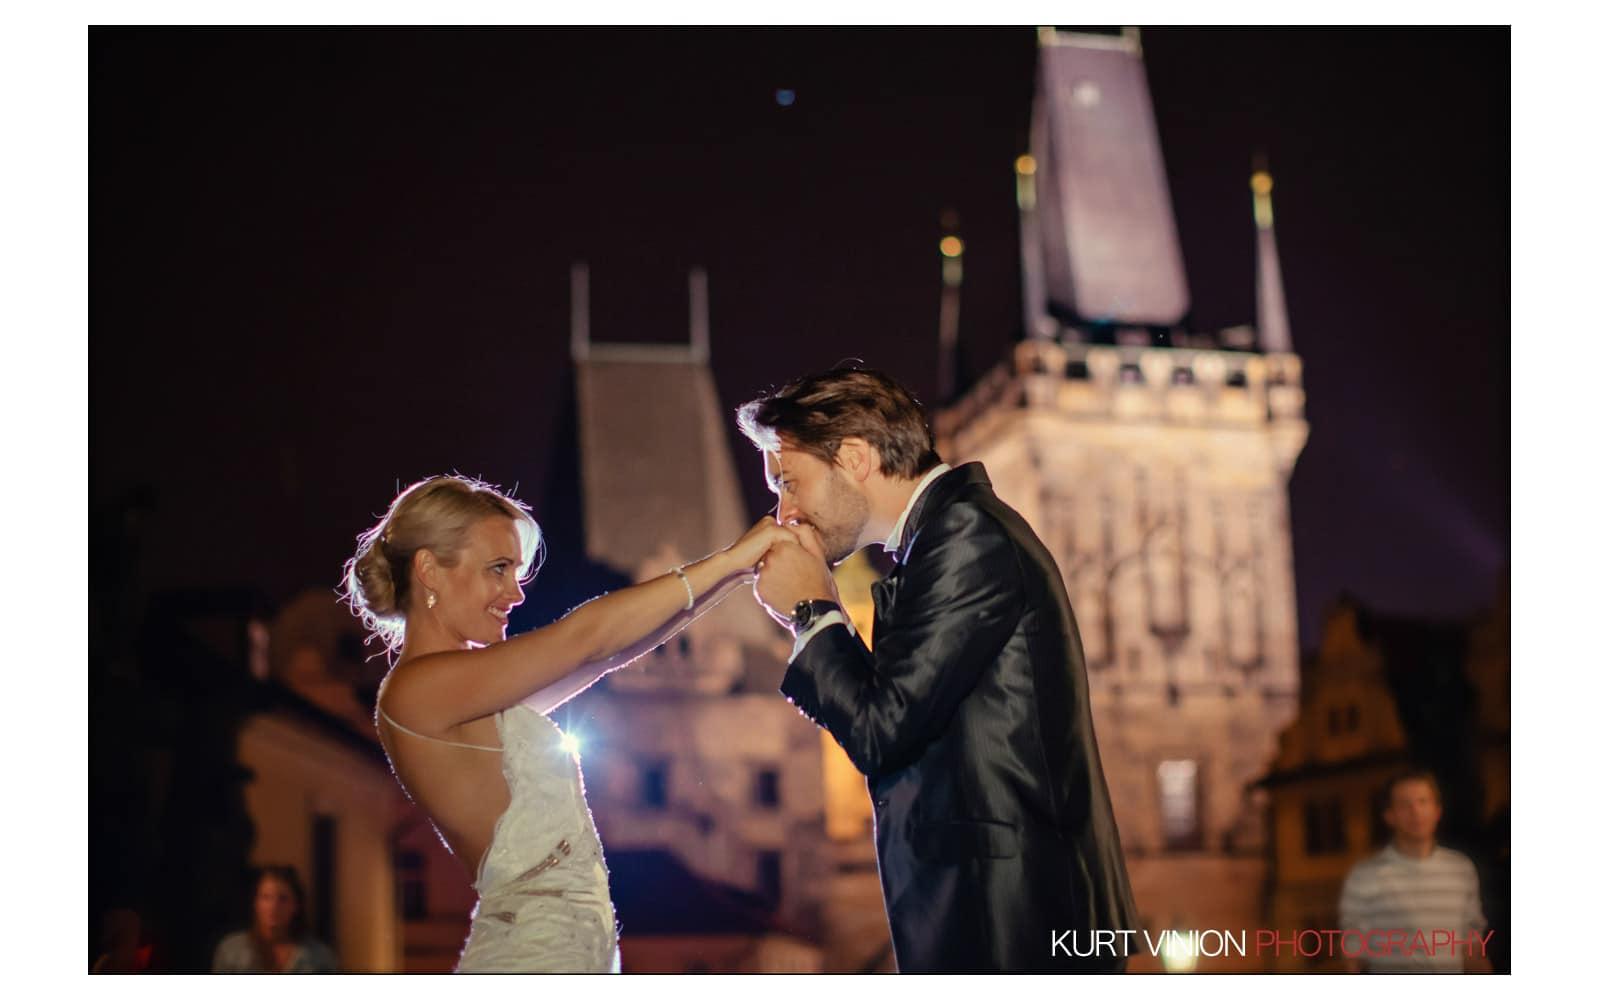 Prague Clementinum wedding / Jess + James - Charles Bridge portraits